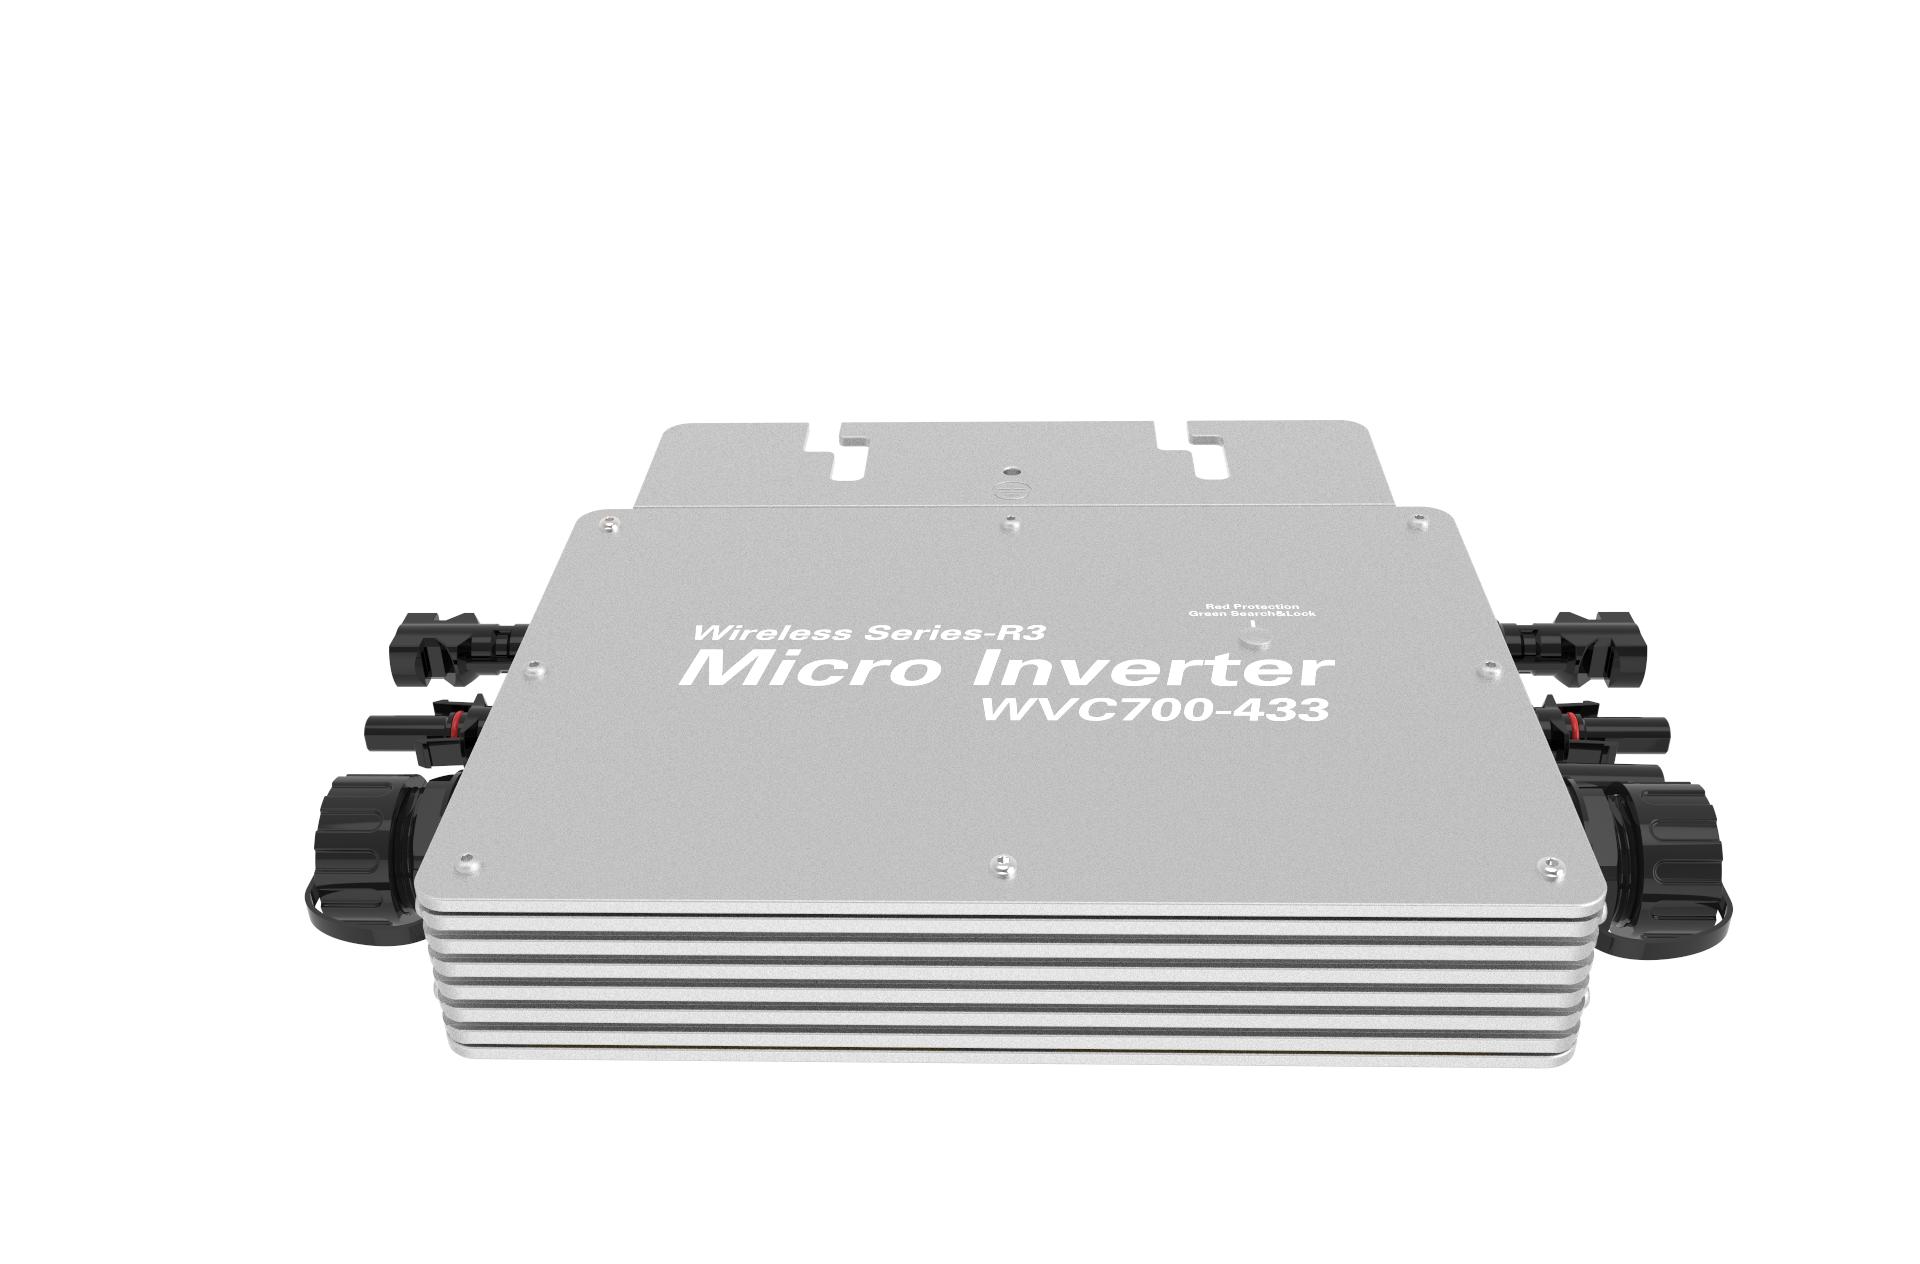 Mikroinwerter_ WVC700 (19)